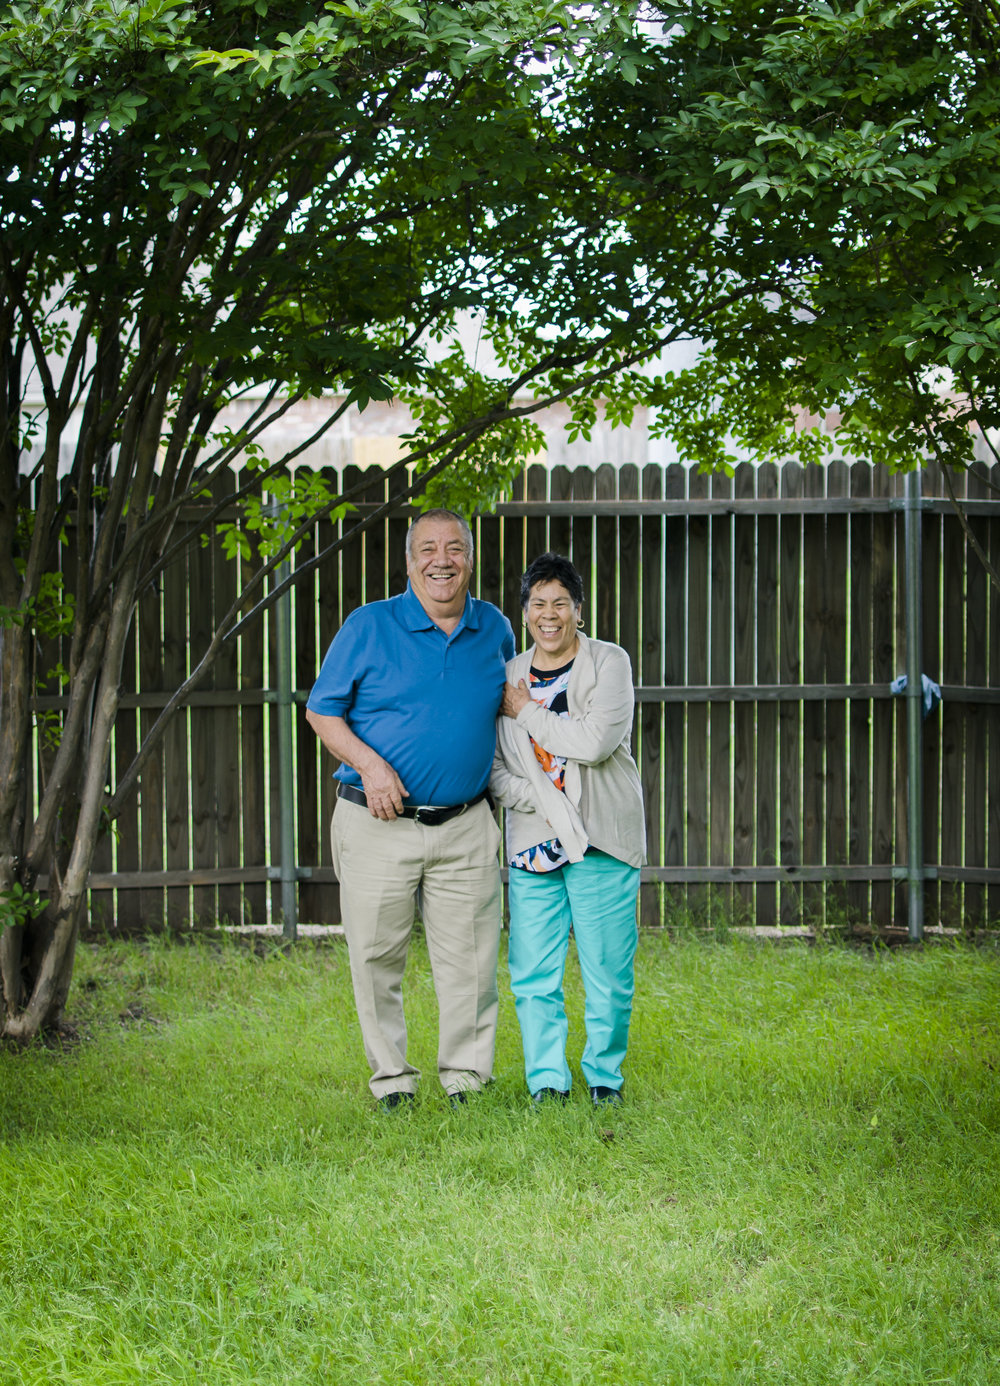 couples-grandparents-jasmine-adisbeth-photography-dallas-fort-worth-photographer-3